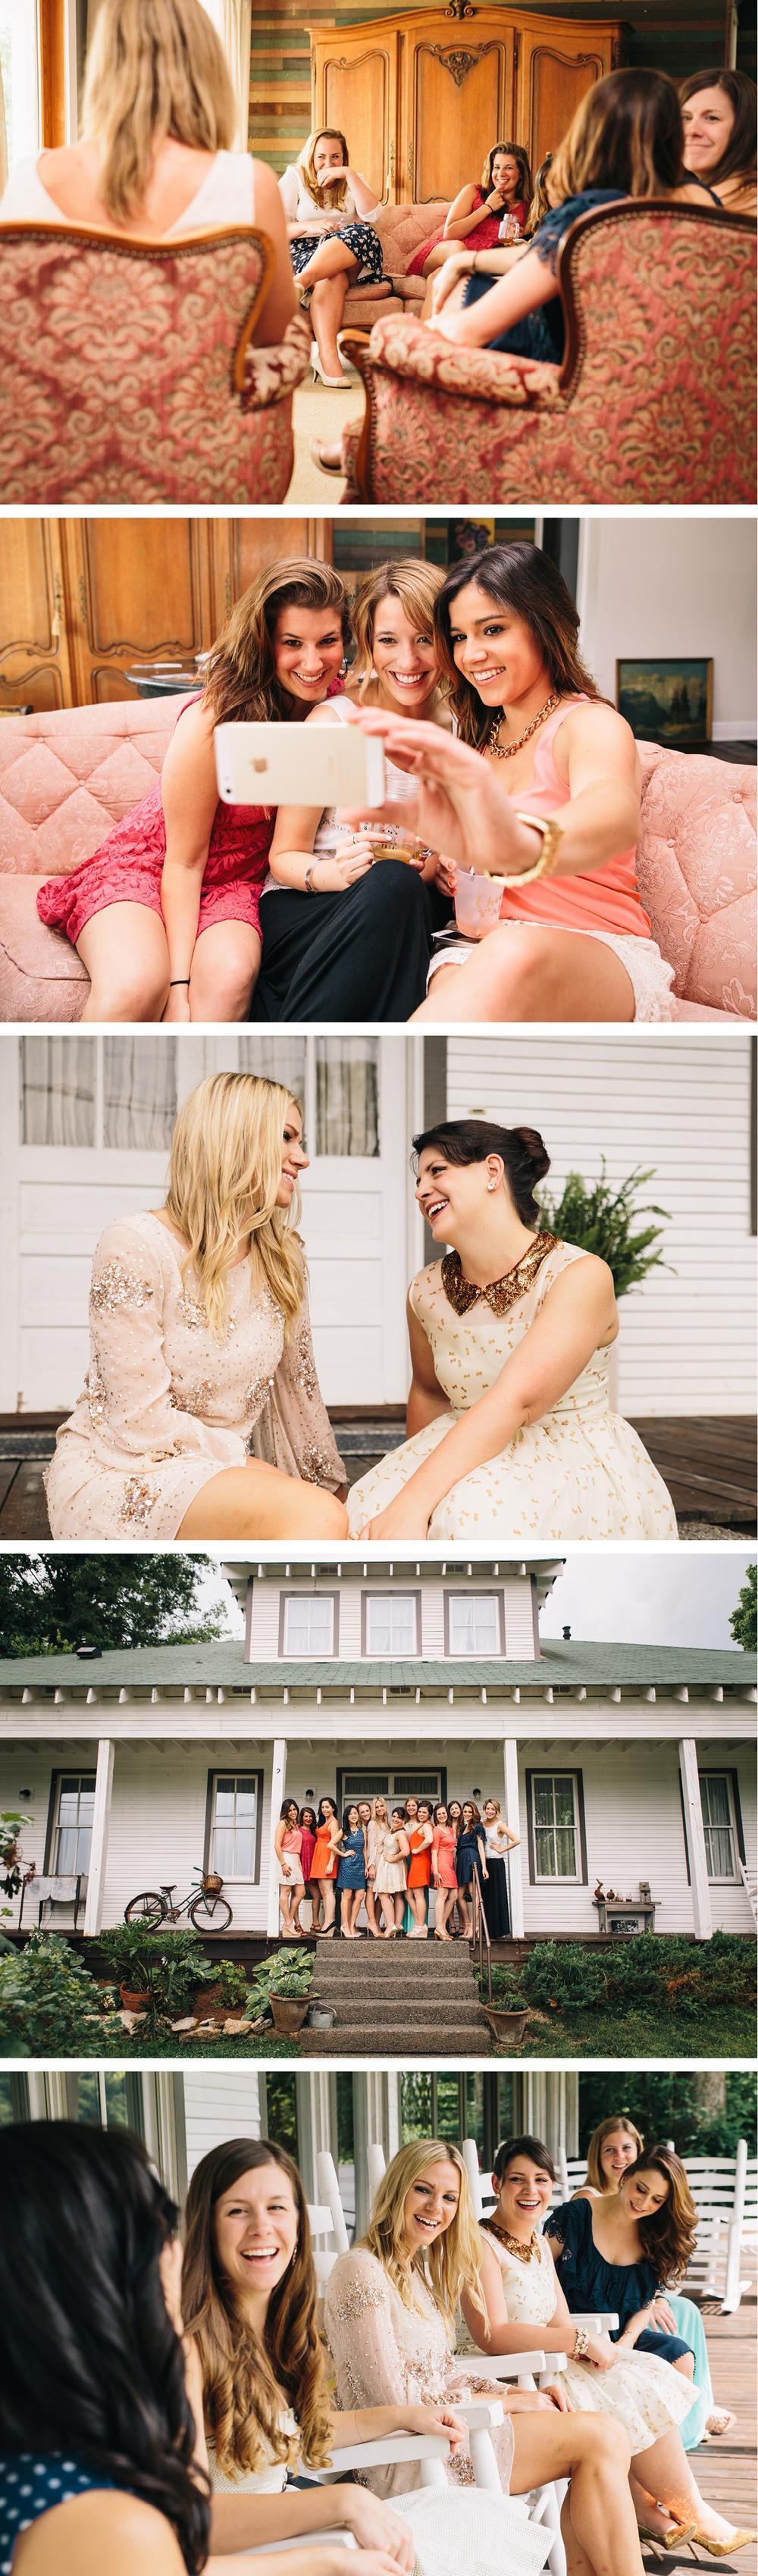 CK-Photo-Nashville-Wedding-Lifestyle-Photographer-cw6.jpg